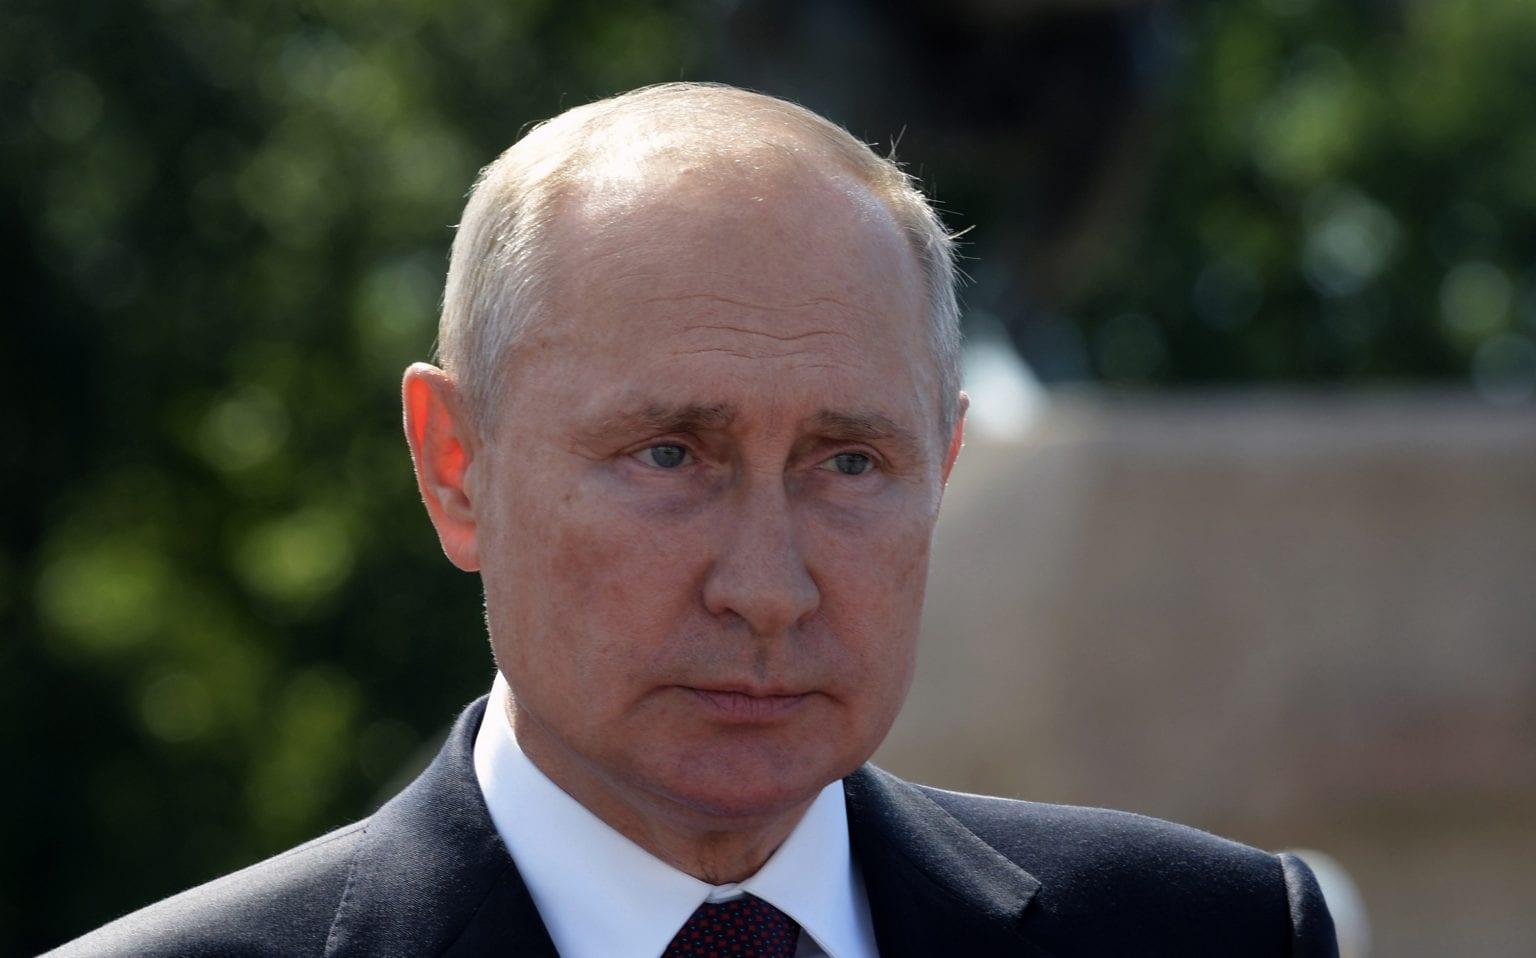 Vladimir-Putin-EFE-1536x958.jpg